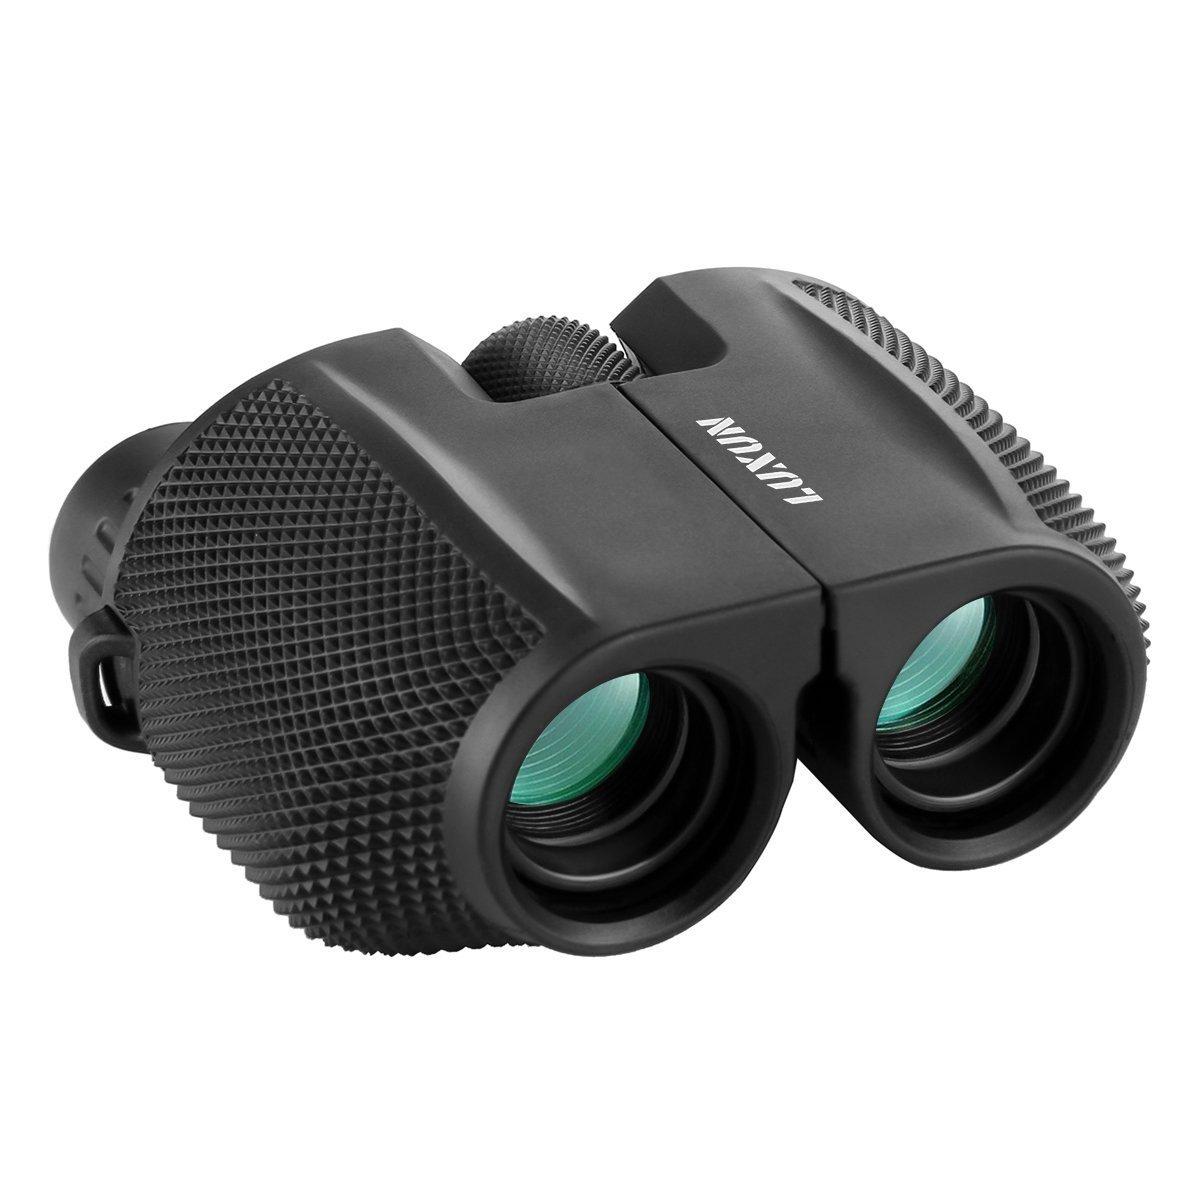 Compact Binoculars, SGODDE 10x25 Waterproof Binocular - Large Eyepiece,Super High Powered Field,Low Light Night Vision Prism Binoculars for Bird Watching Outdoor Shooting Travelling Adults Kids